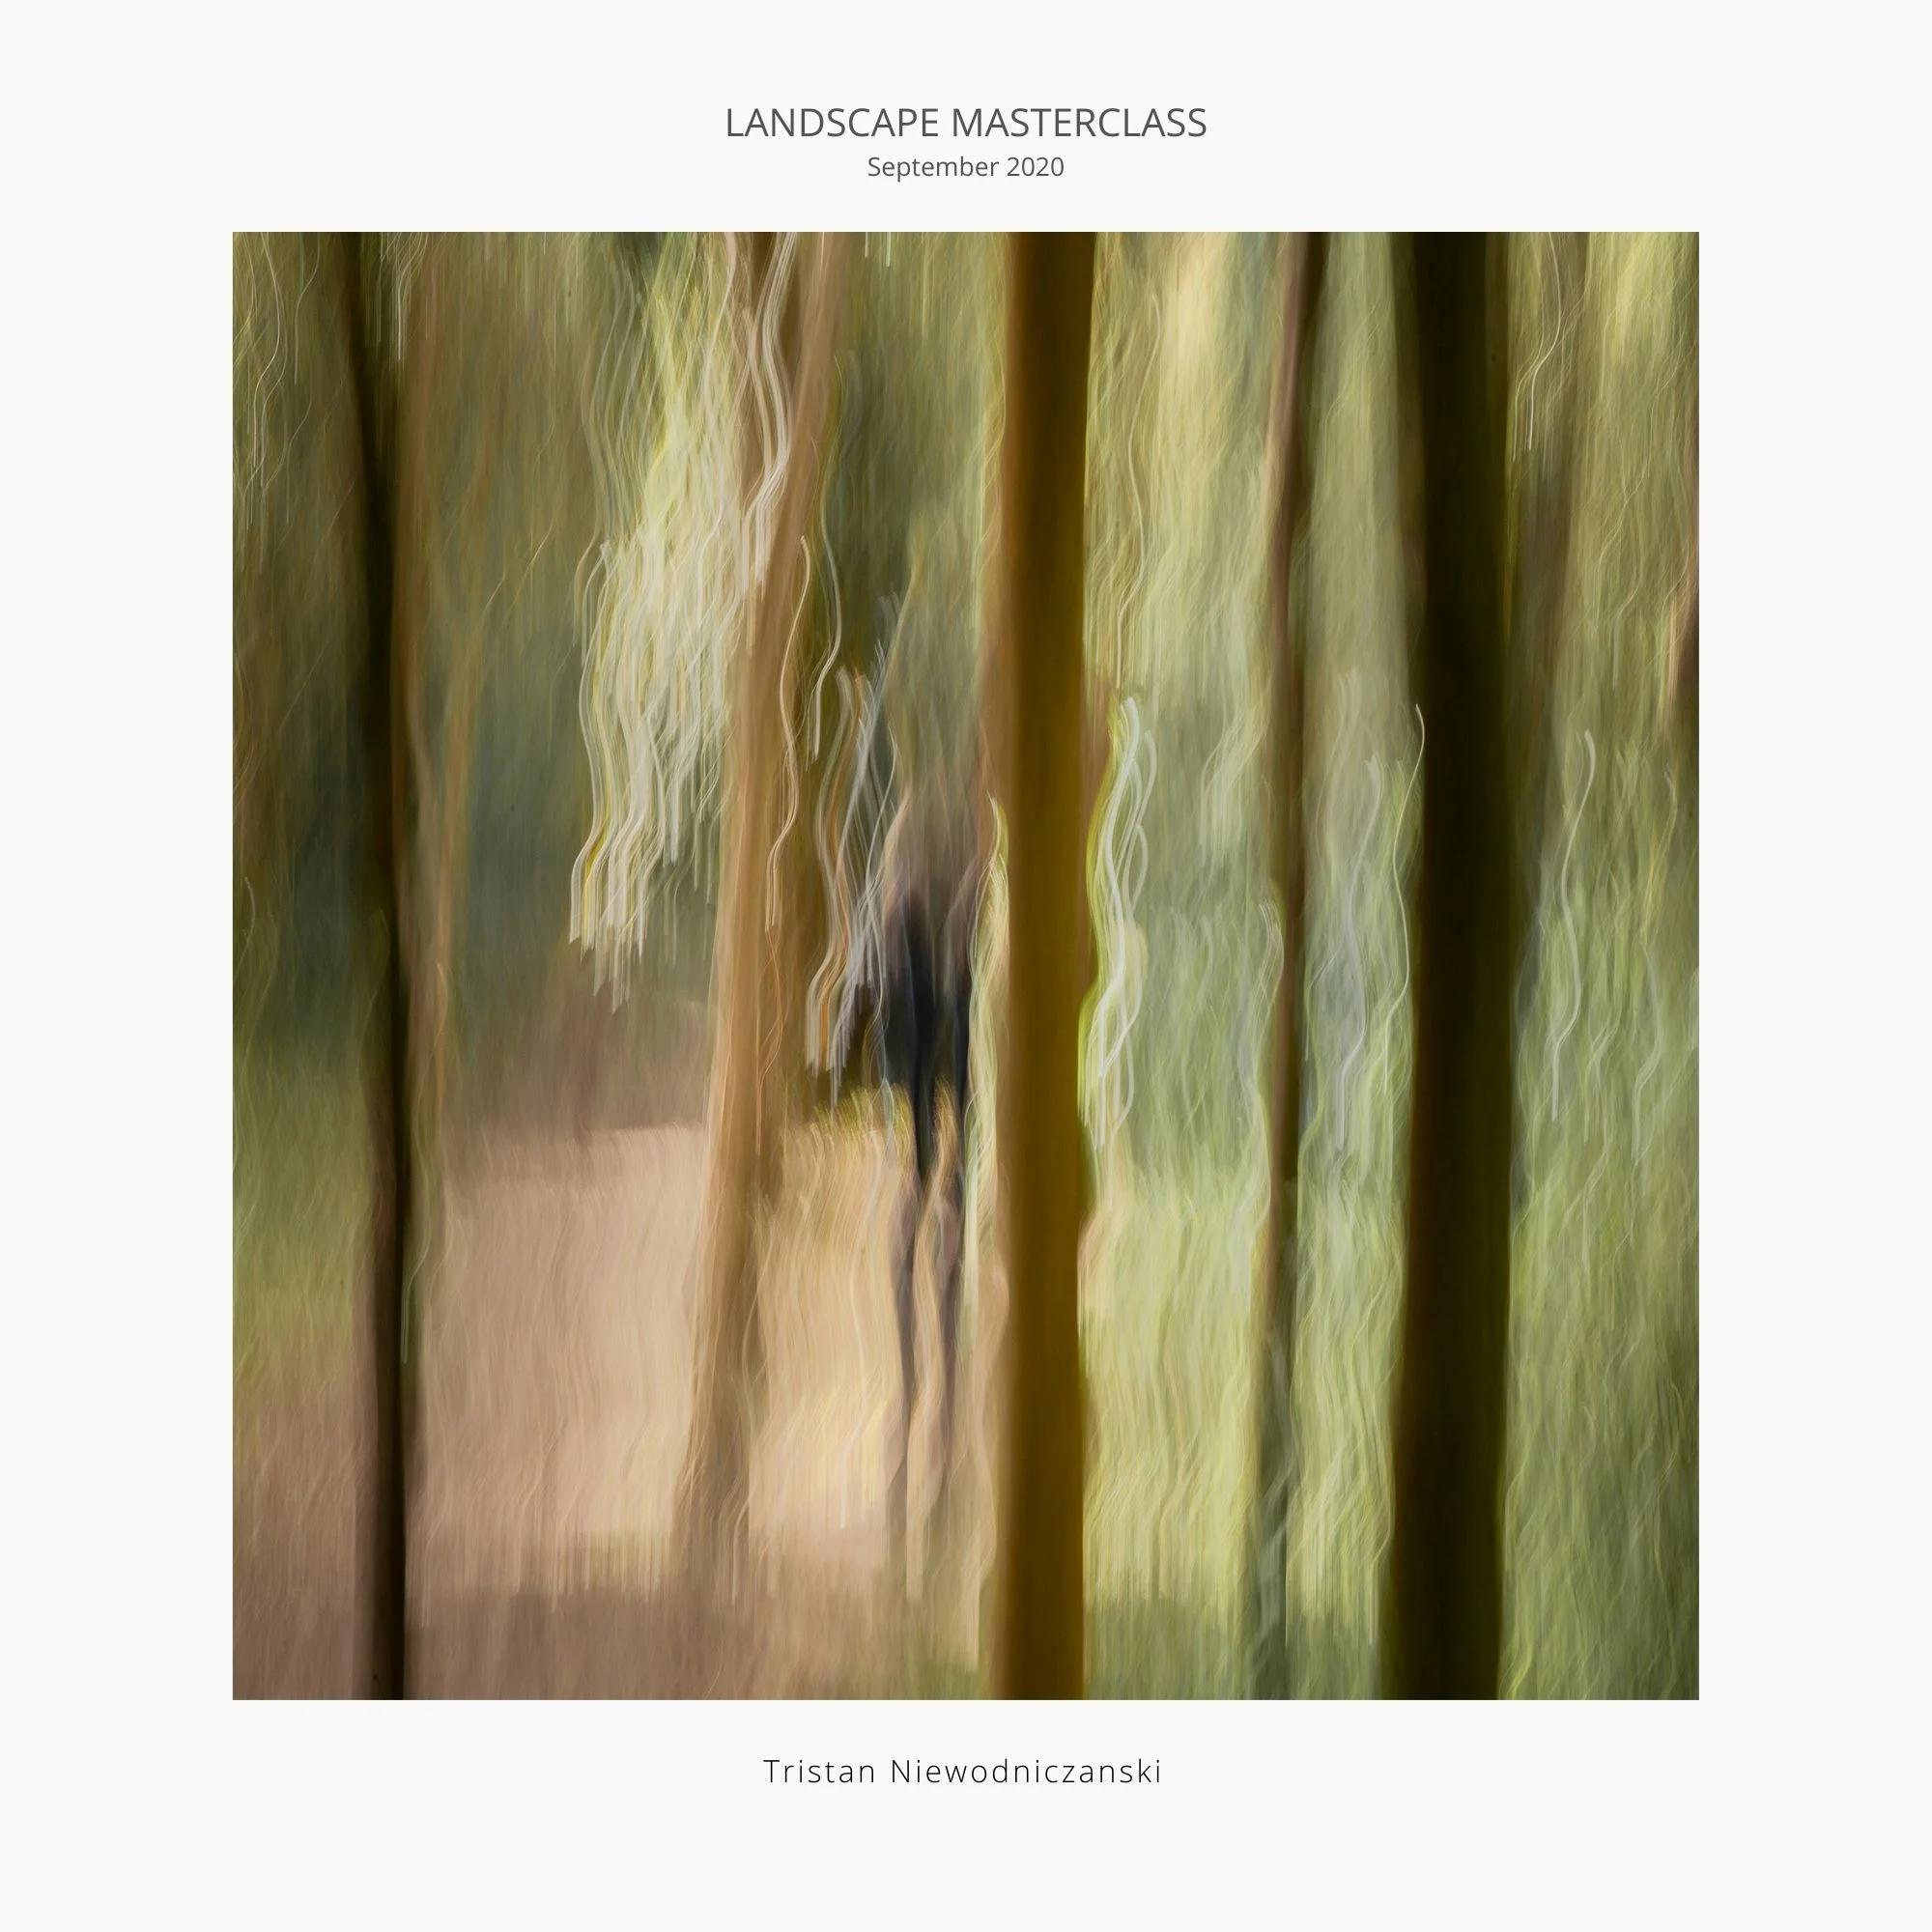 Creative Landscape Photograph by Tristan Niewodniczanski